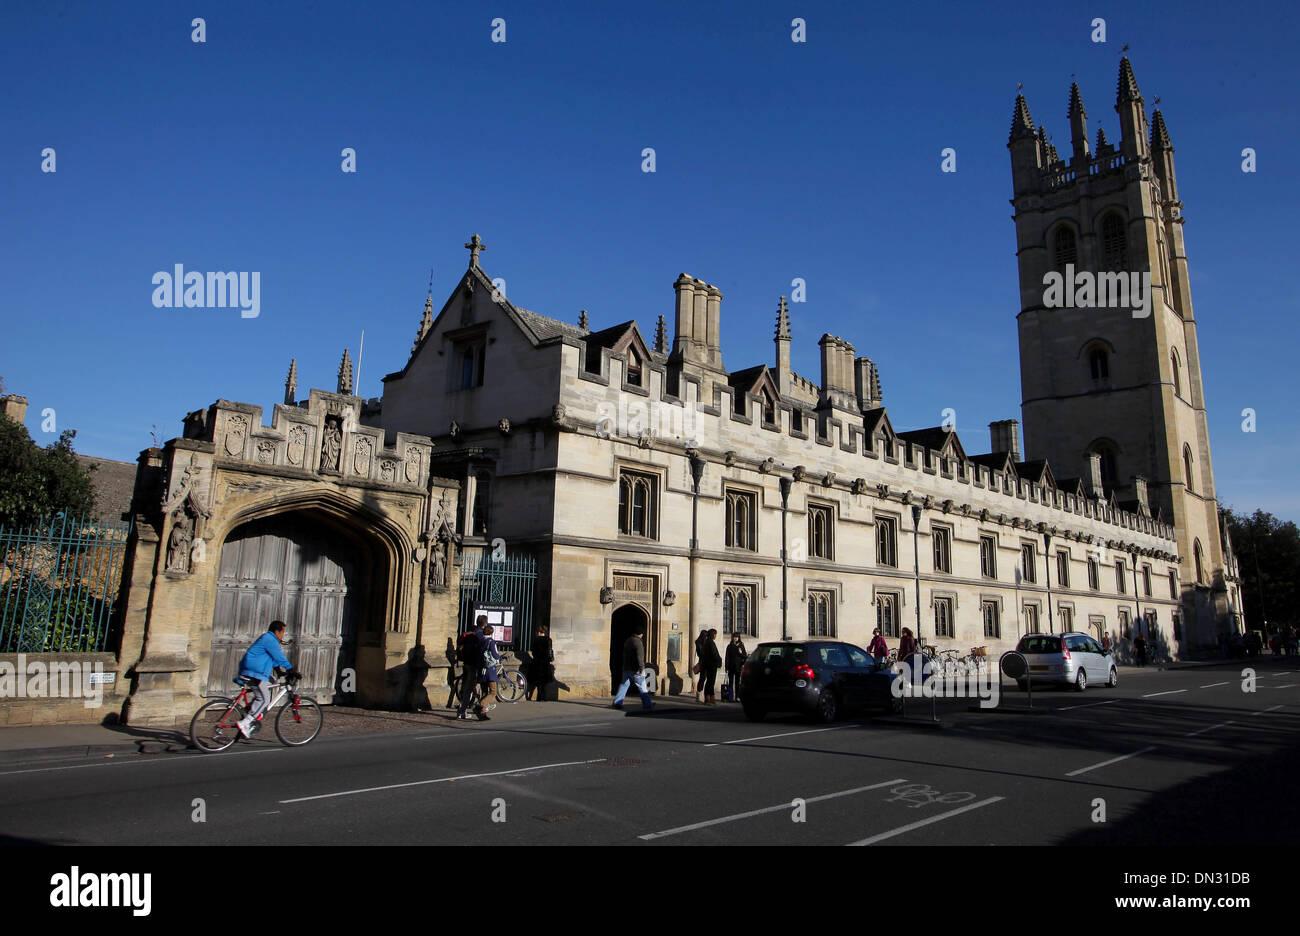 GV of the historic Oxford University building. - Stock Image